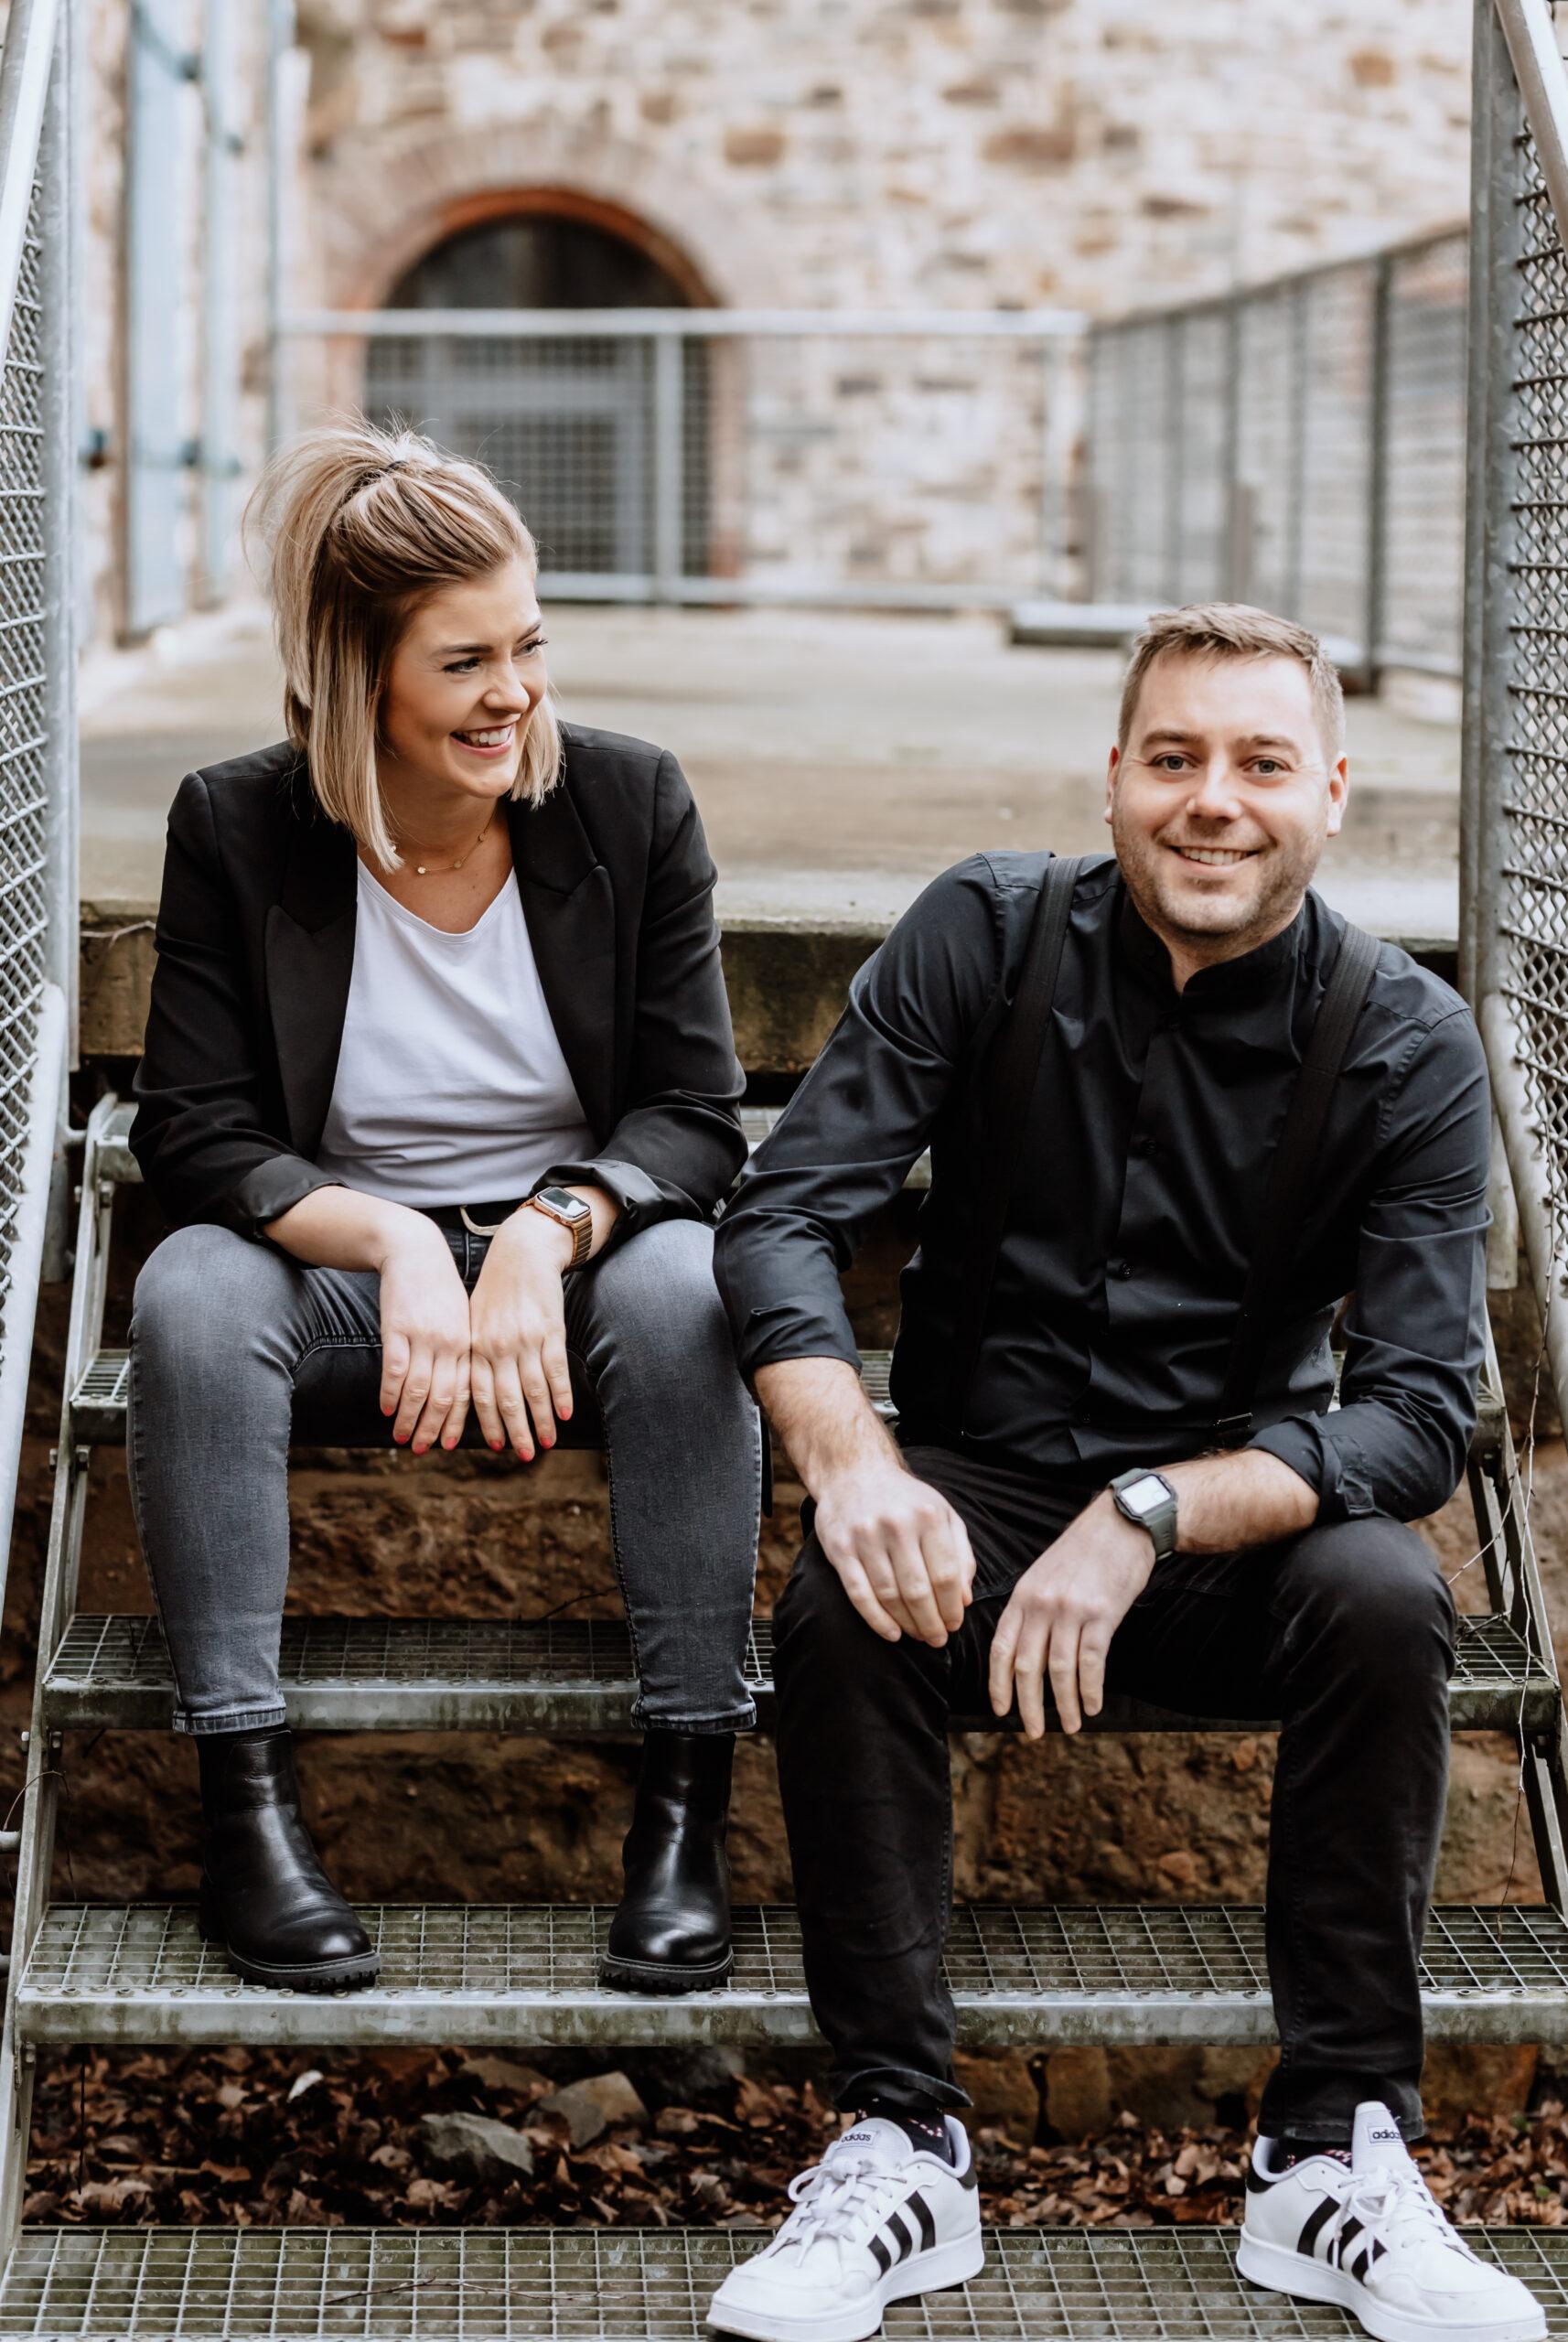 Teamfoto Bernd und Carolin Kramer